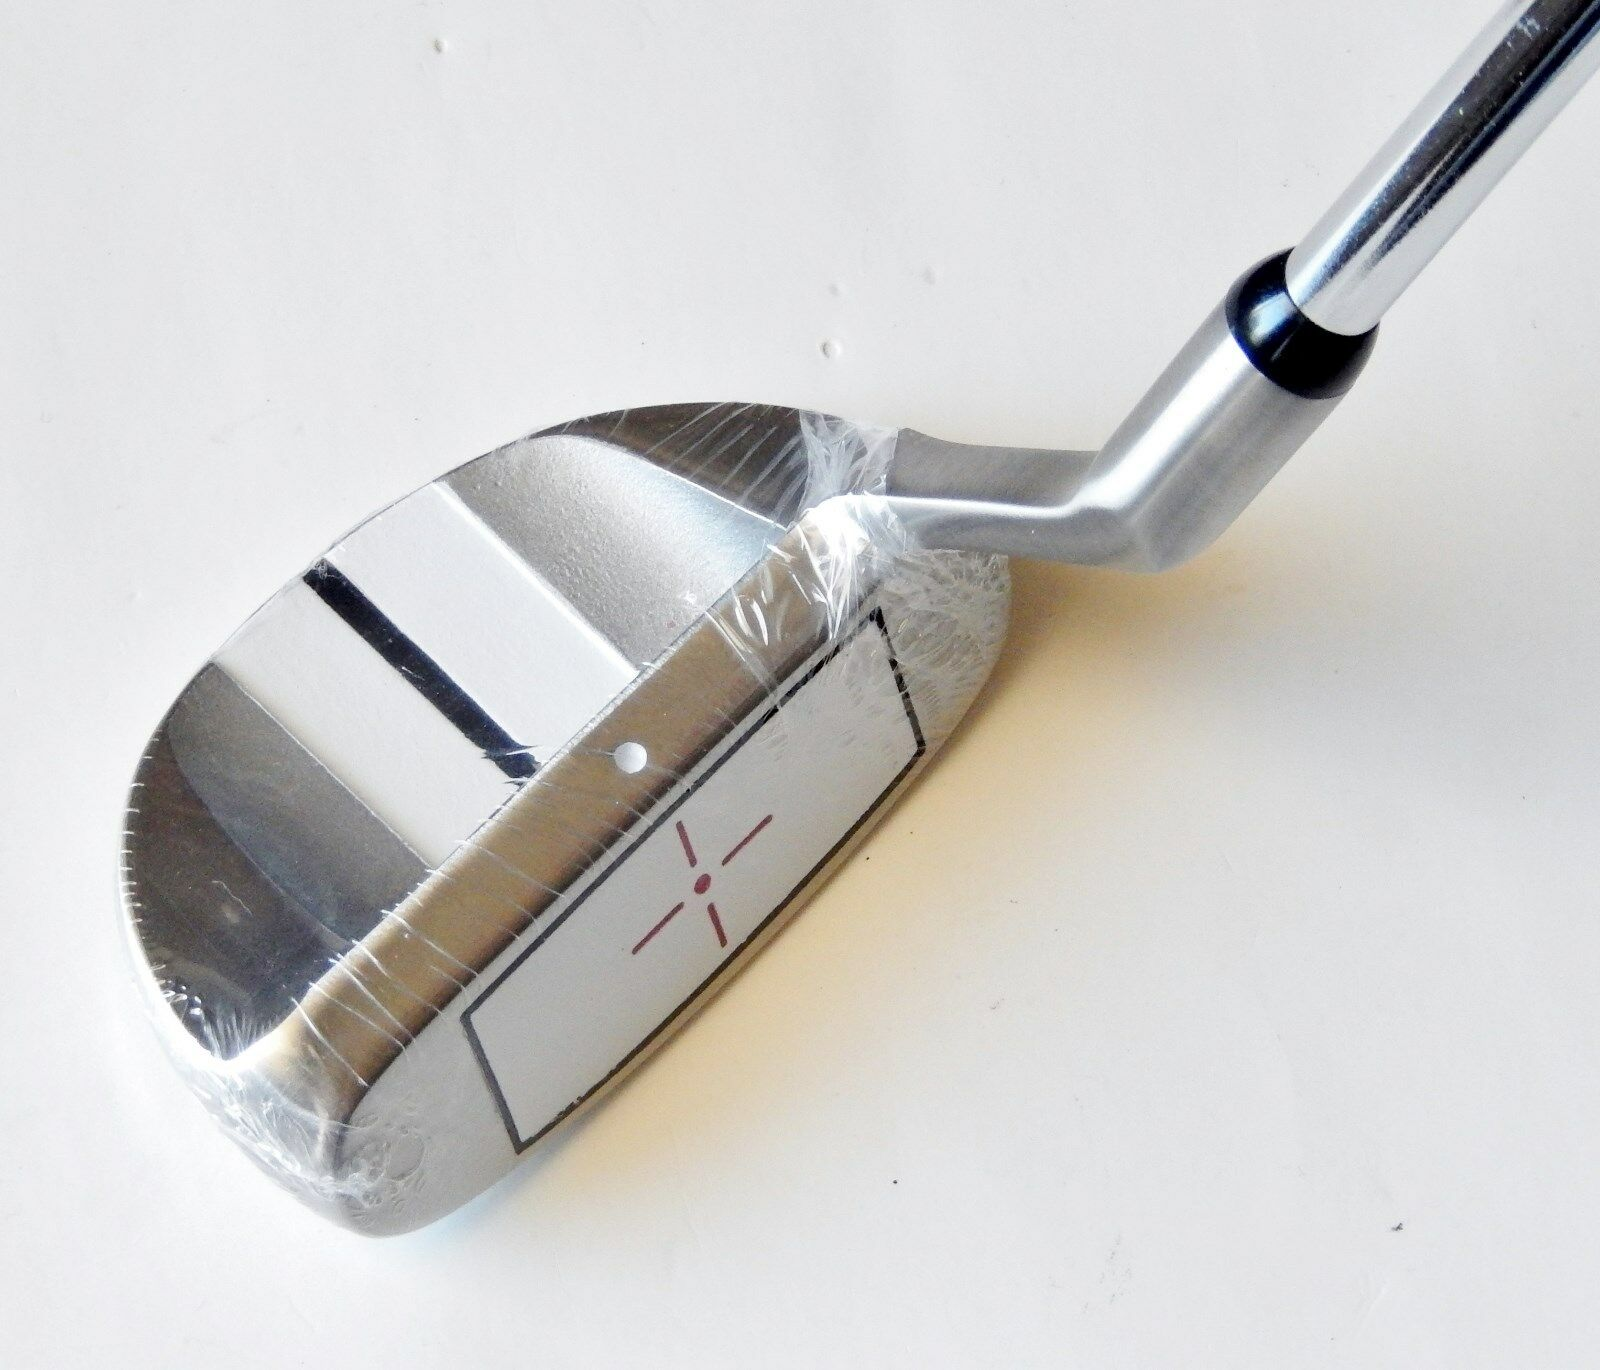 New Men's Extreme 5 Golf Chipper + Steel Shaft Installed, U Pick Club Length